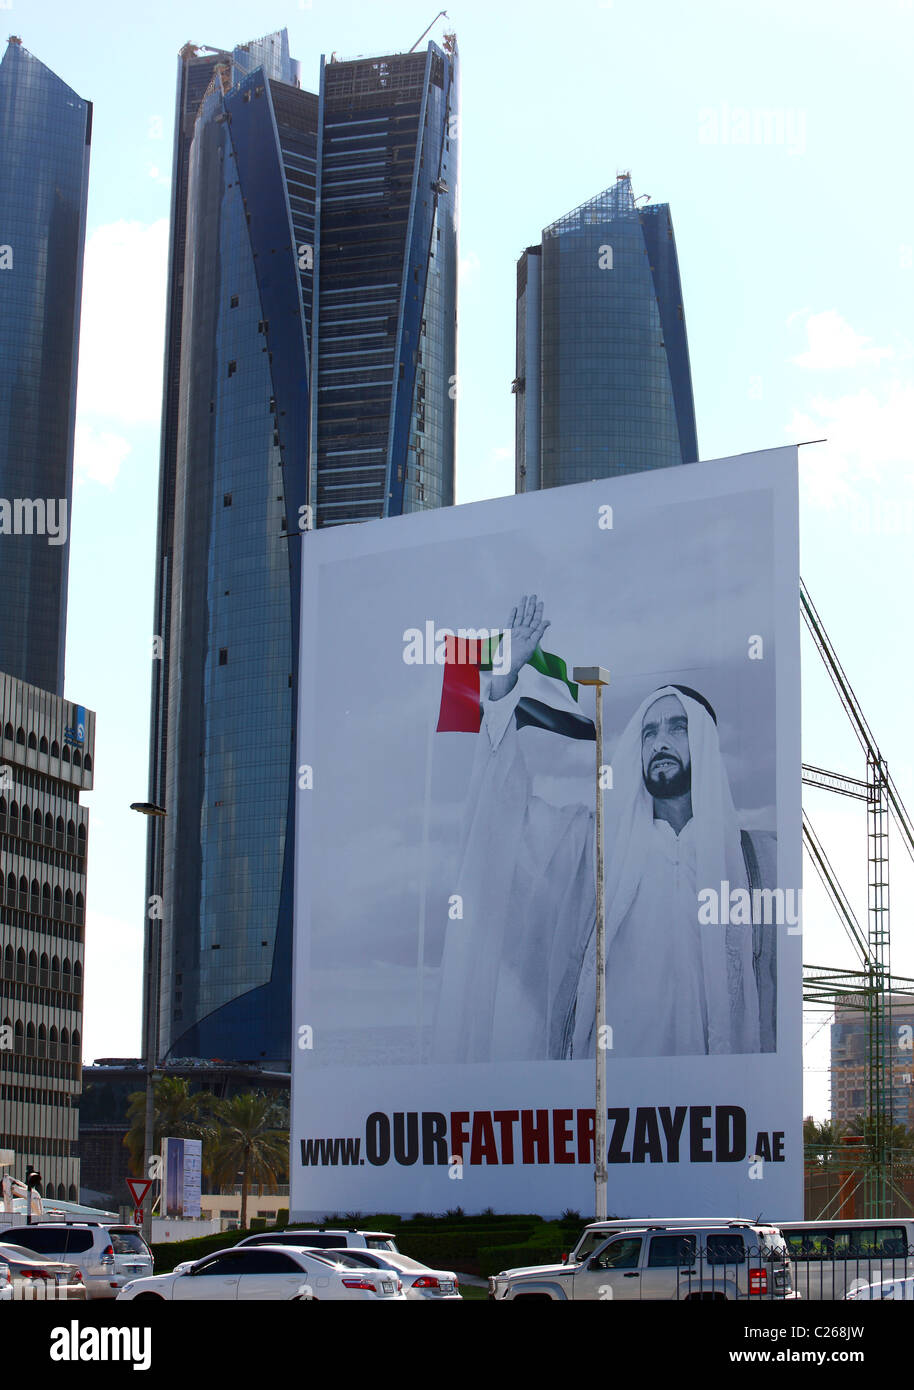 Etihad Towers, office and hotel building, city center of Abu Dhabi, capital of United Arab Emirates. Stock Photo